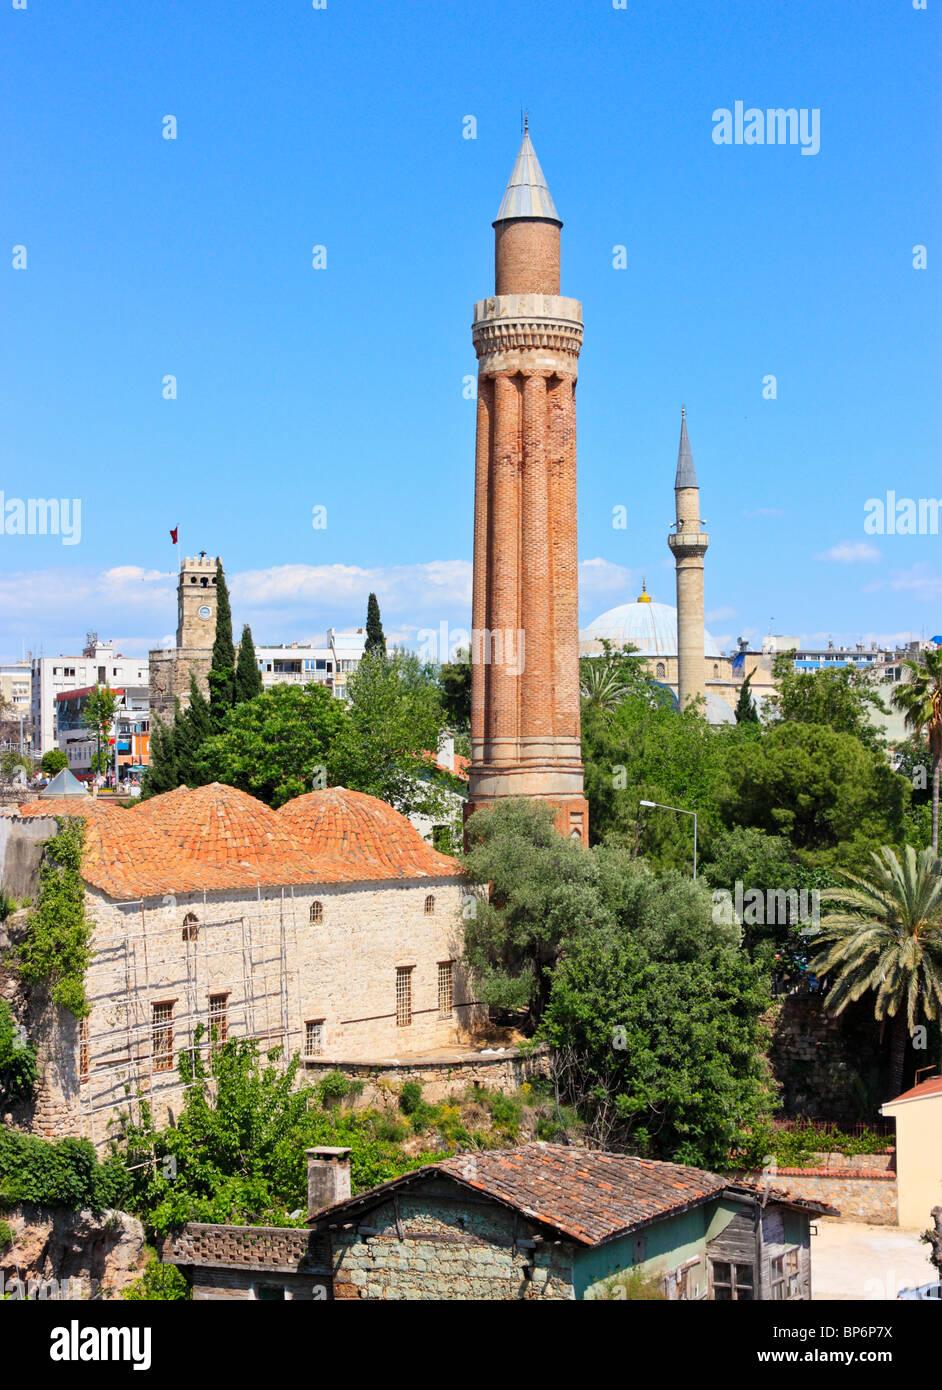 Yivli Minaret in the old town of Antalya, Turkey - Stock Image